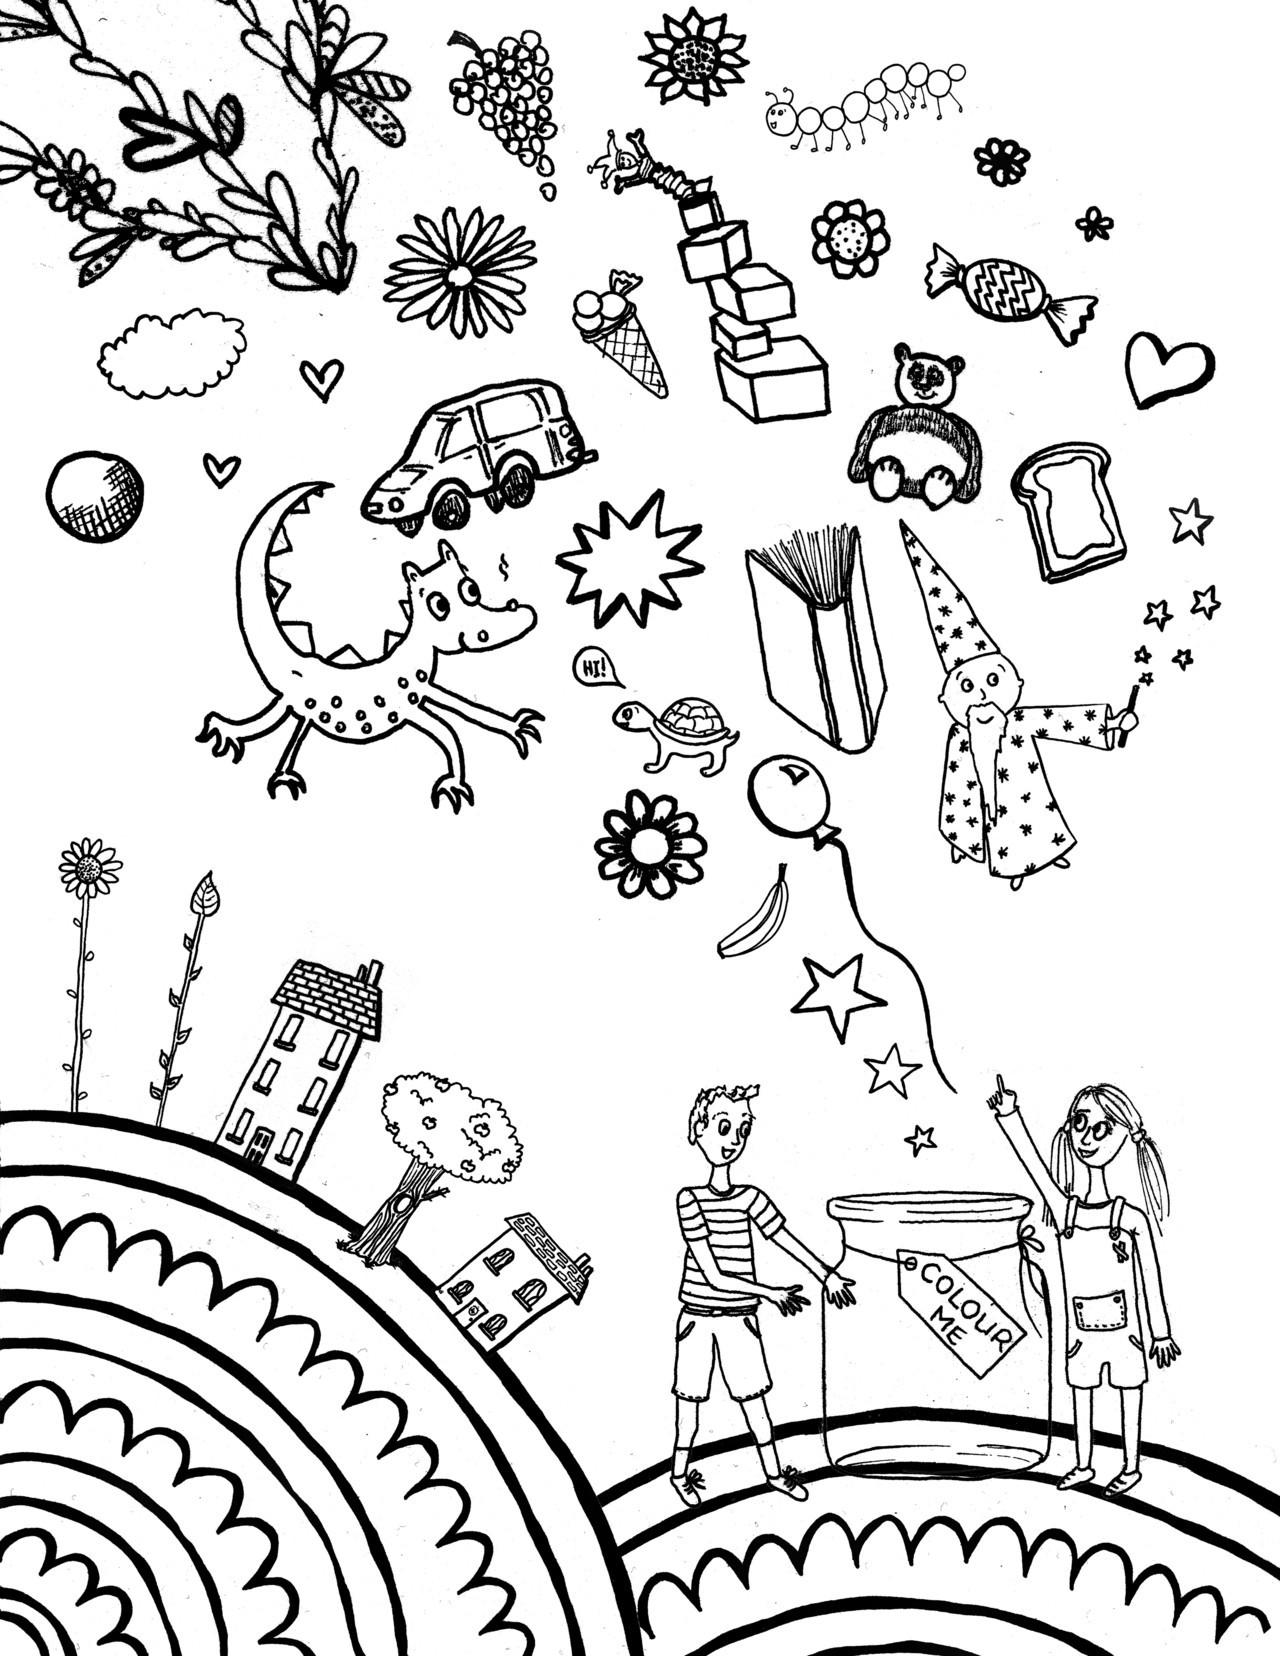 Rachel Walsh Illustration